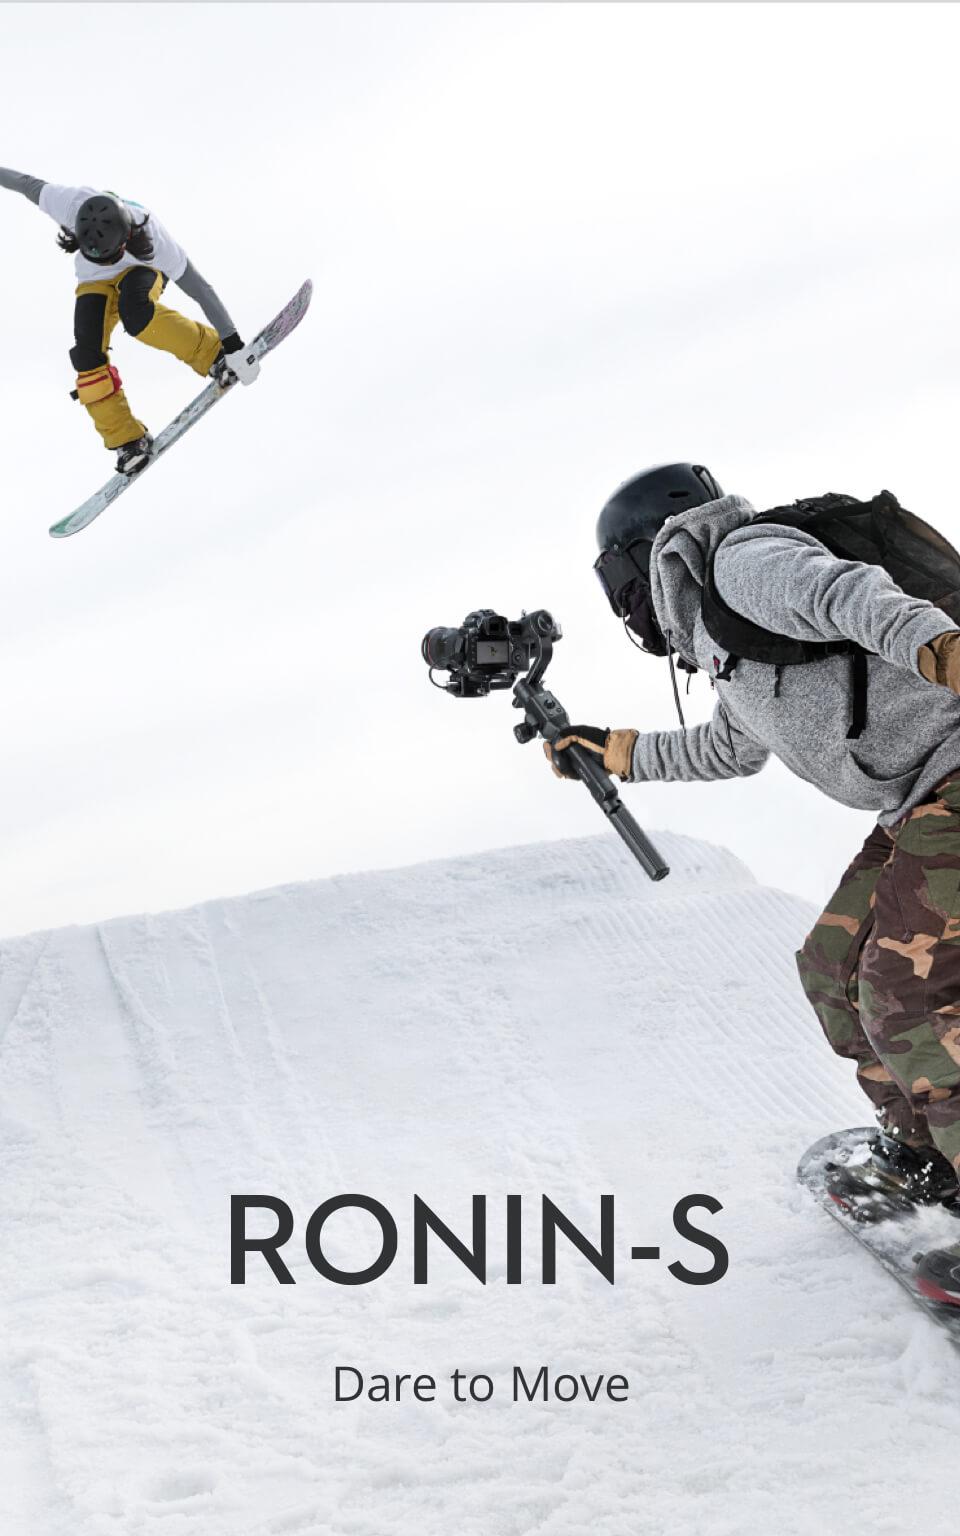 ronins_Store_M_320px_EN_1@3x.jpg